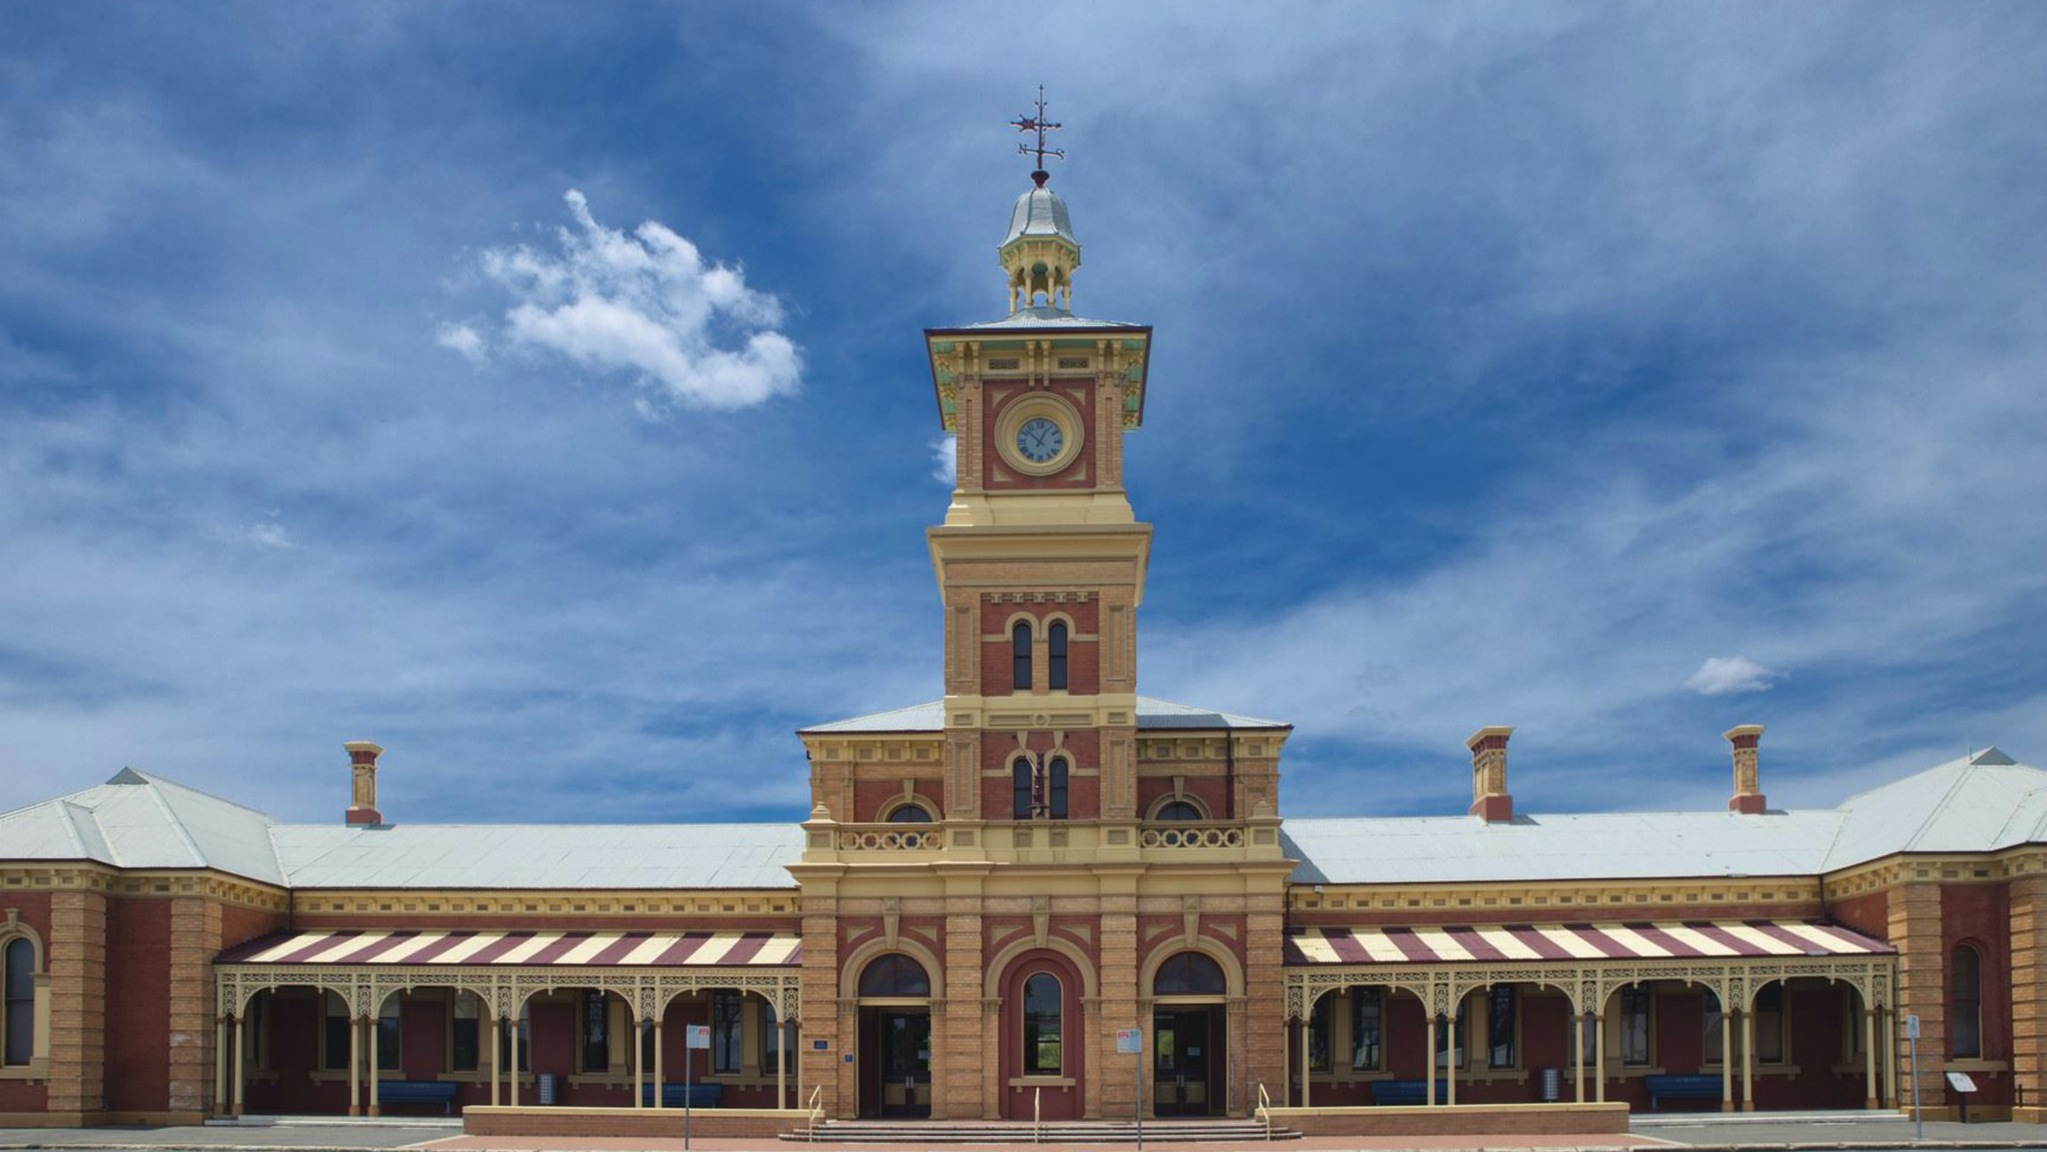 Albury Railway Station